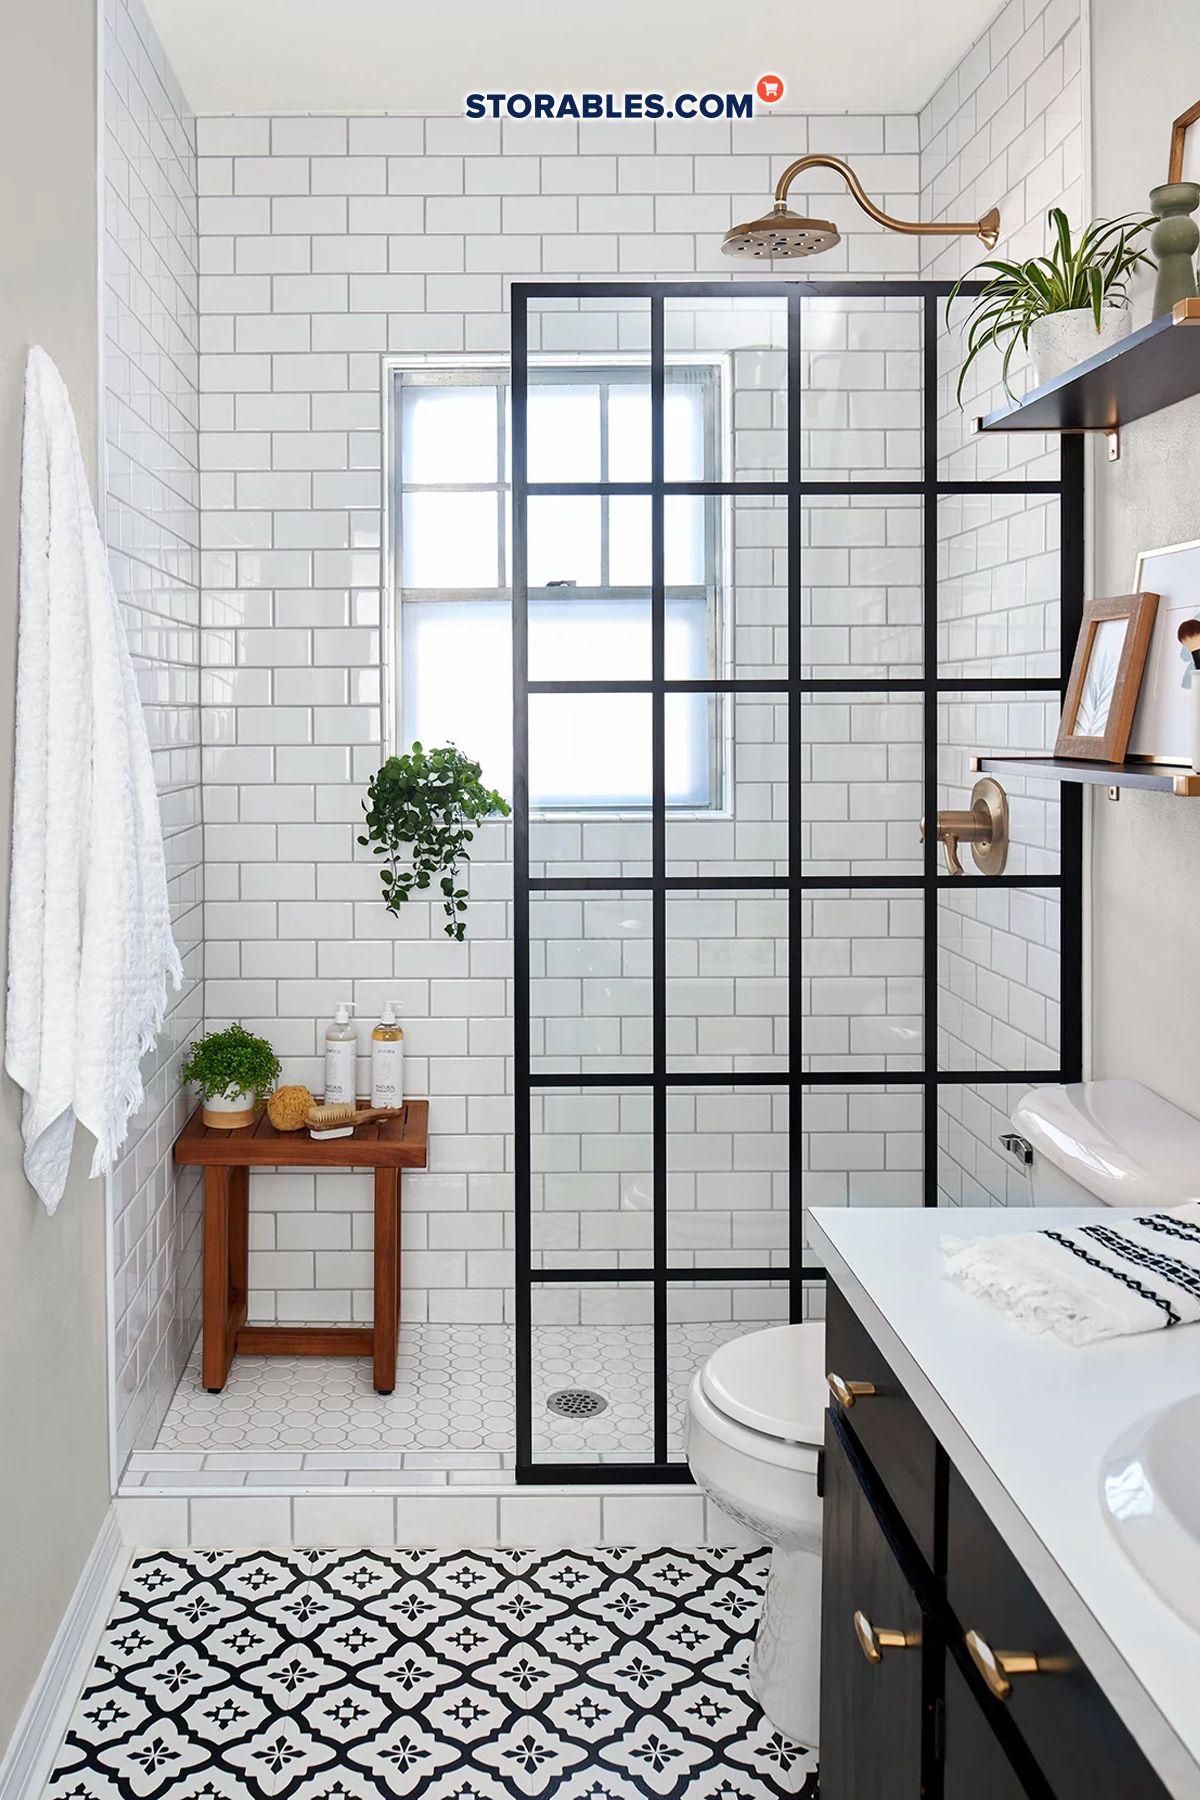 7 Brilliant Master Bathroom Ideas That Look Magical In 2021 Gray Bathroom Decor Diy Bathroom Remodel Modern Bathroom Decor Bathroom design ideas 2021